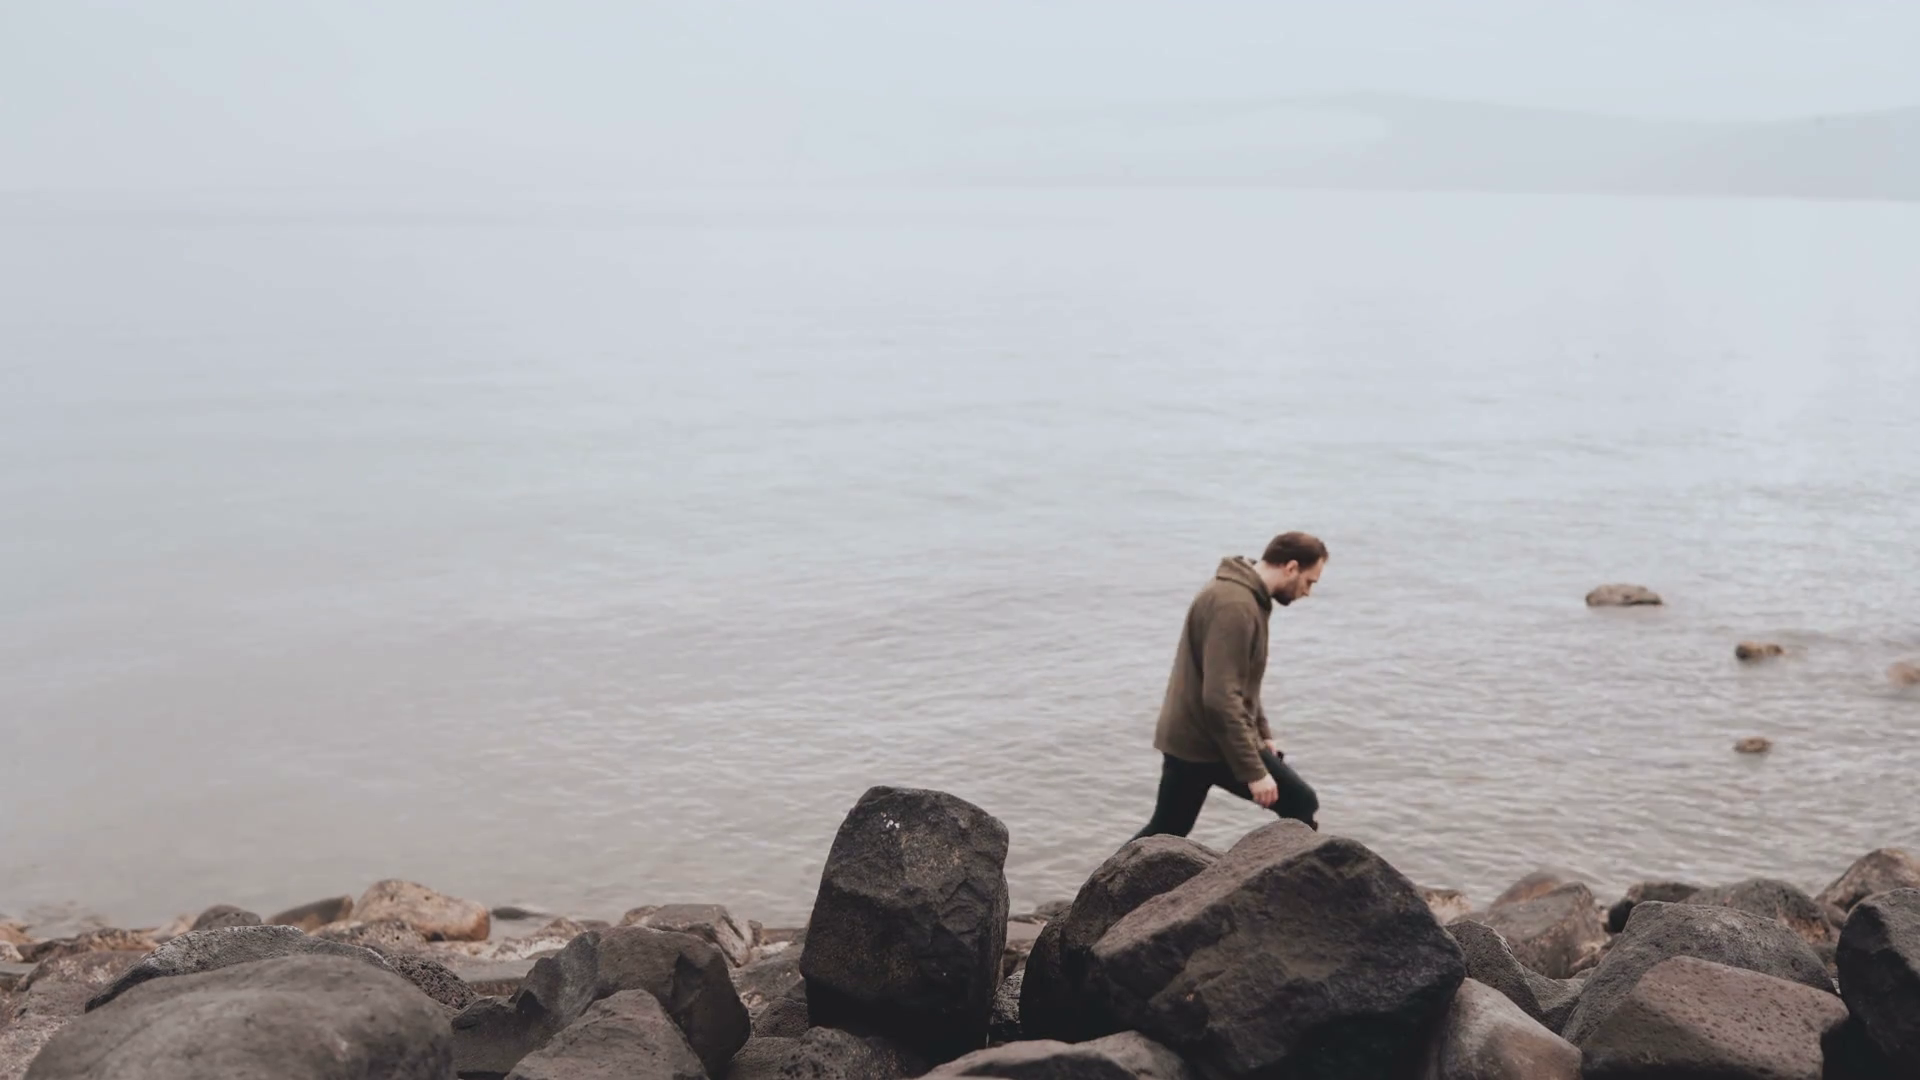 Caucasian man at the edge of Sea of Galilee Big stones shore of 1920x1080